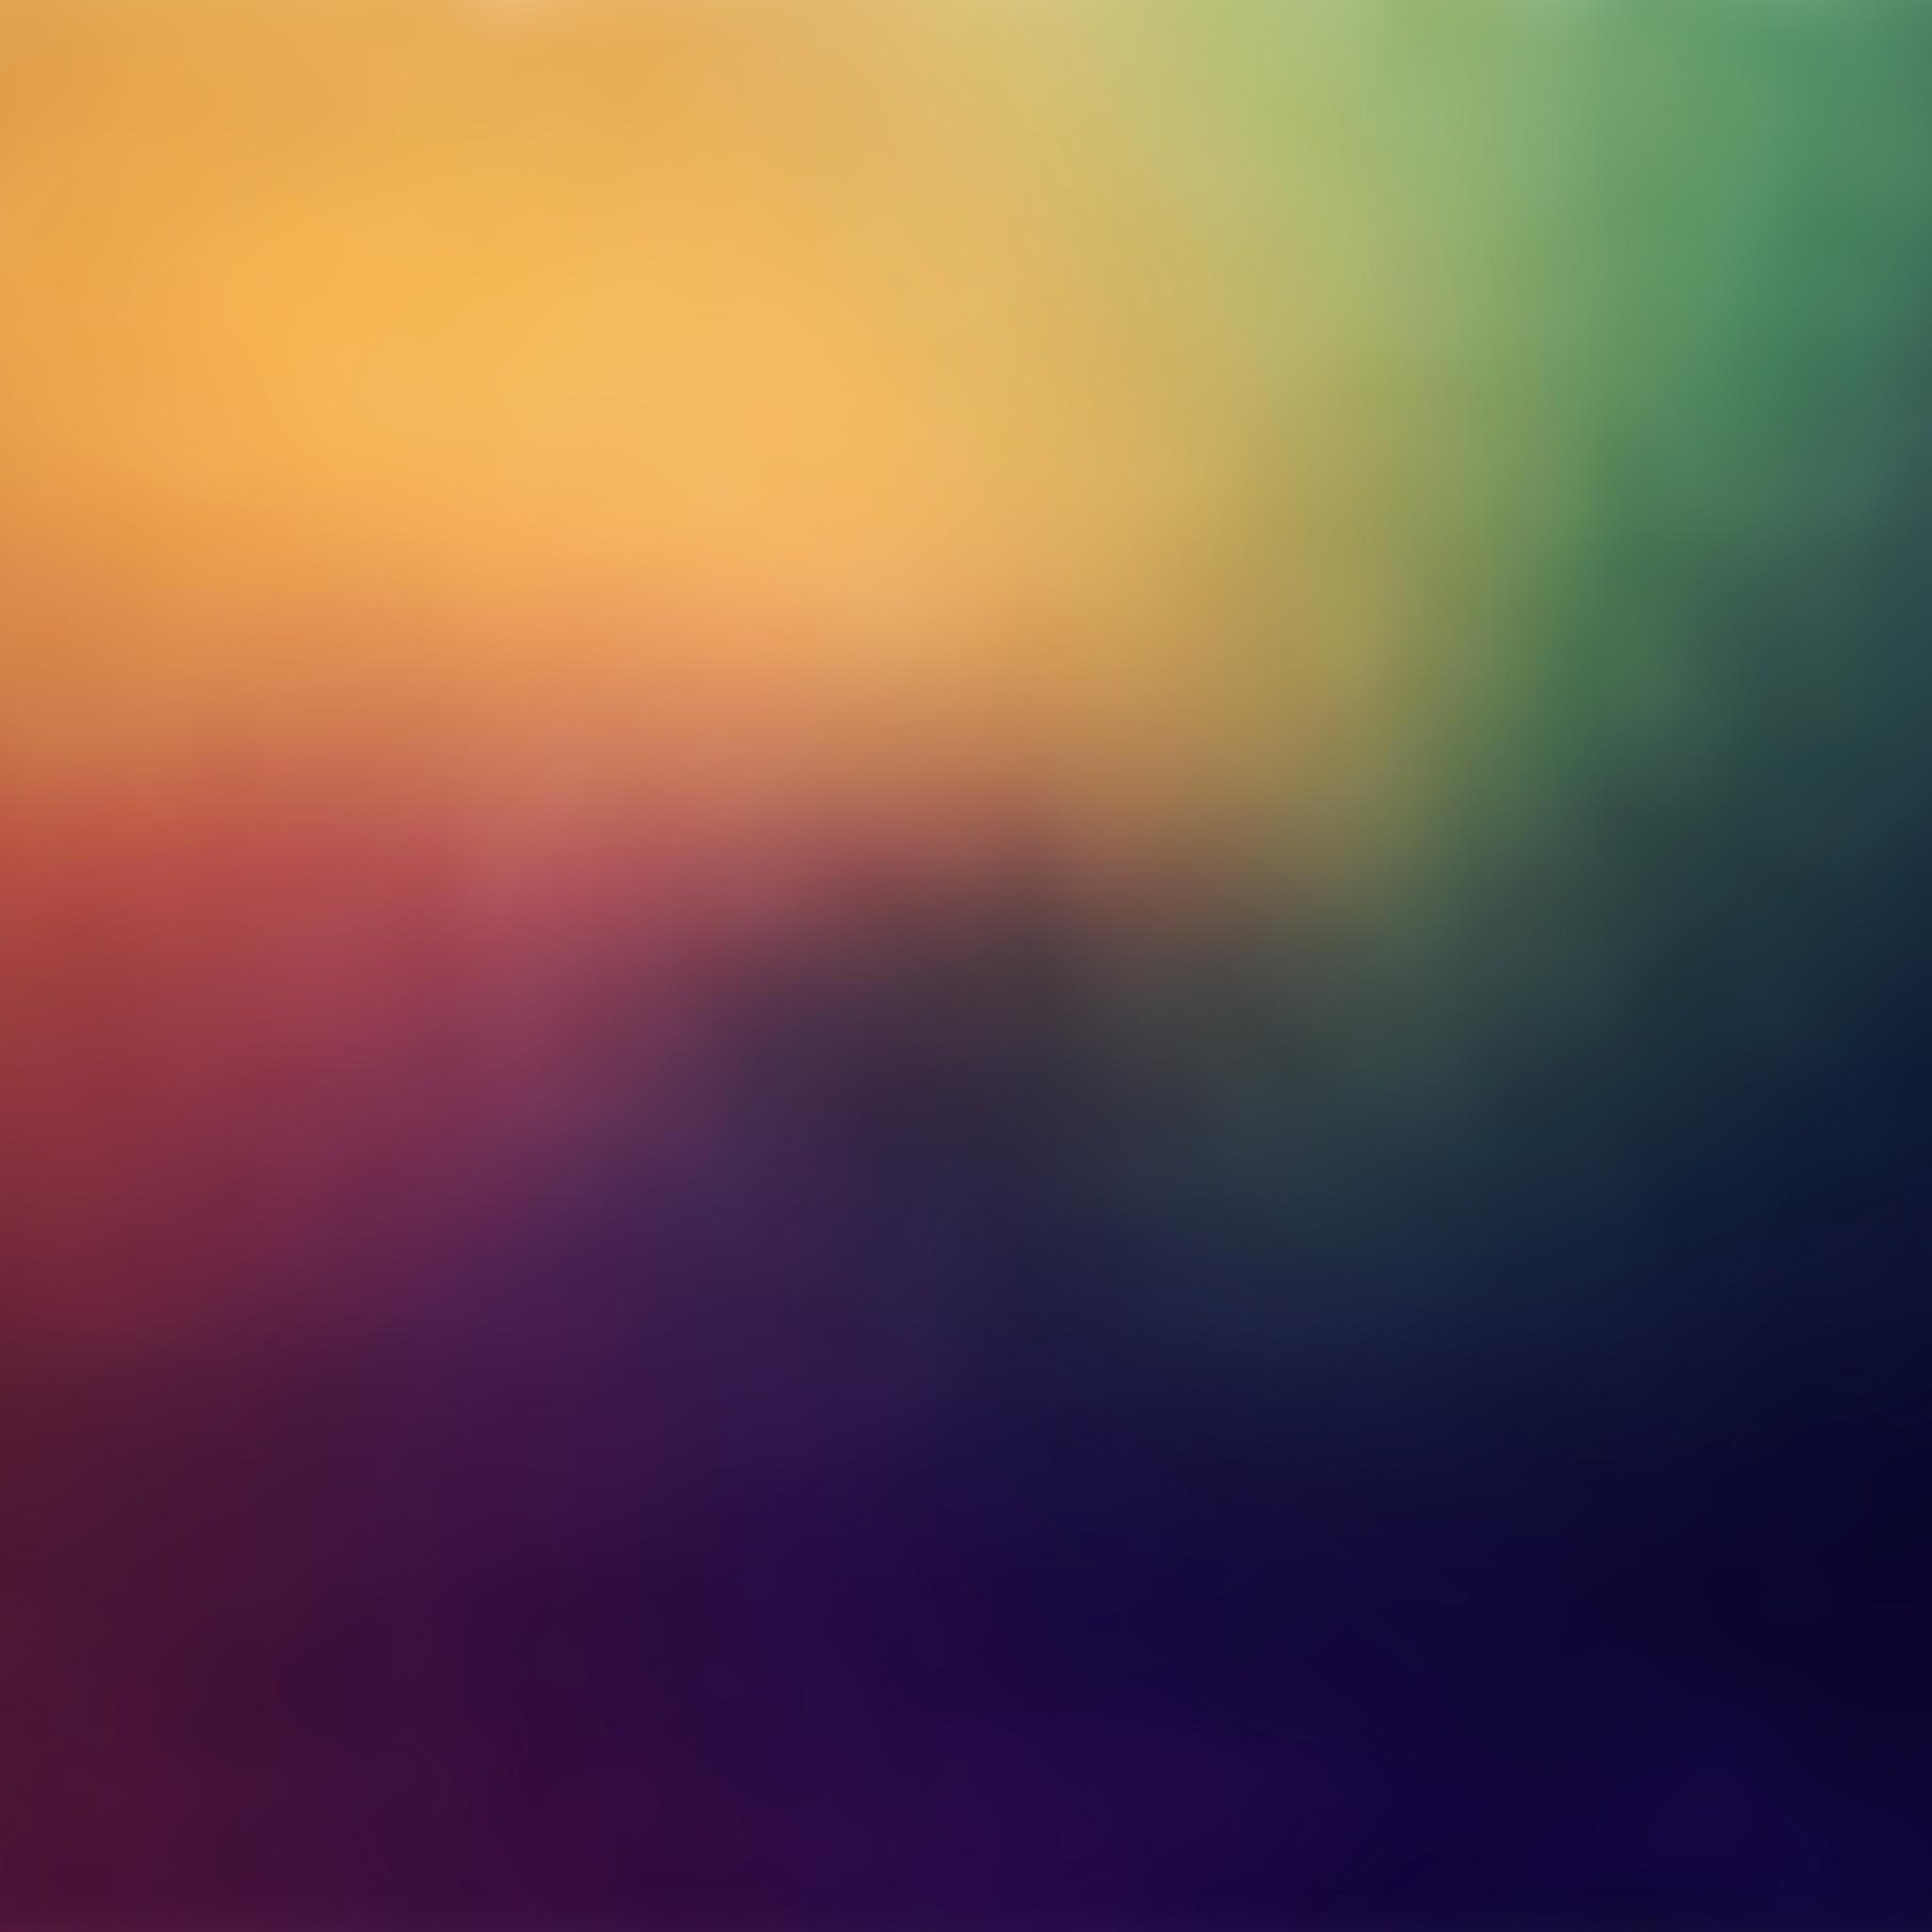 Rainbow 3Wallpapers iPad Retina Rainbow   iPad Retina